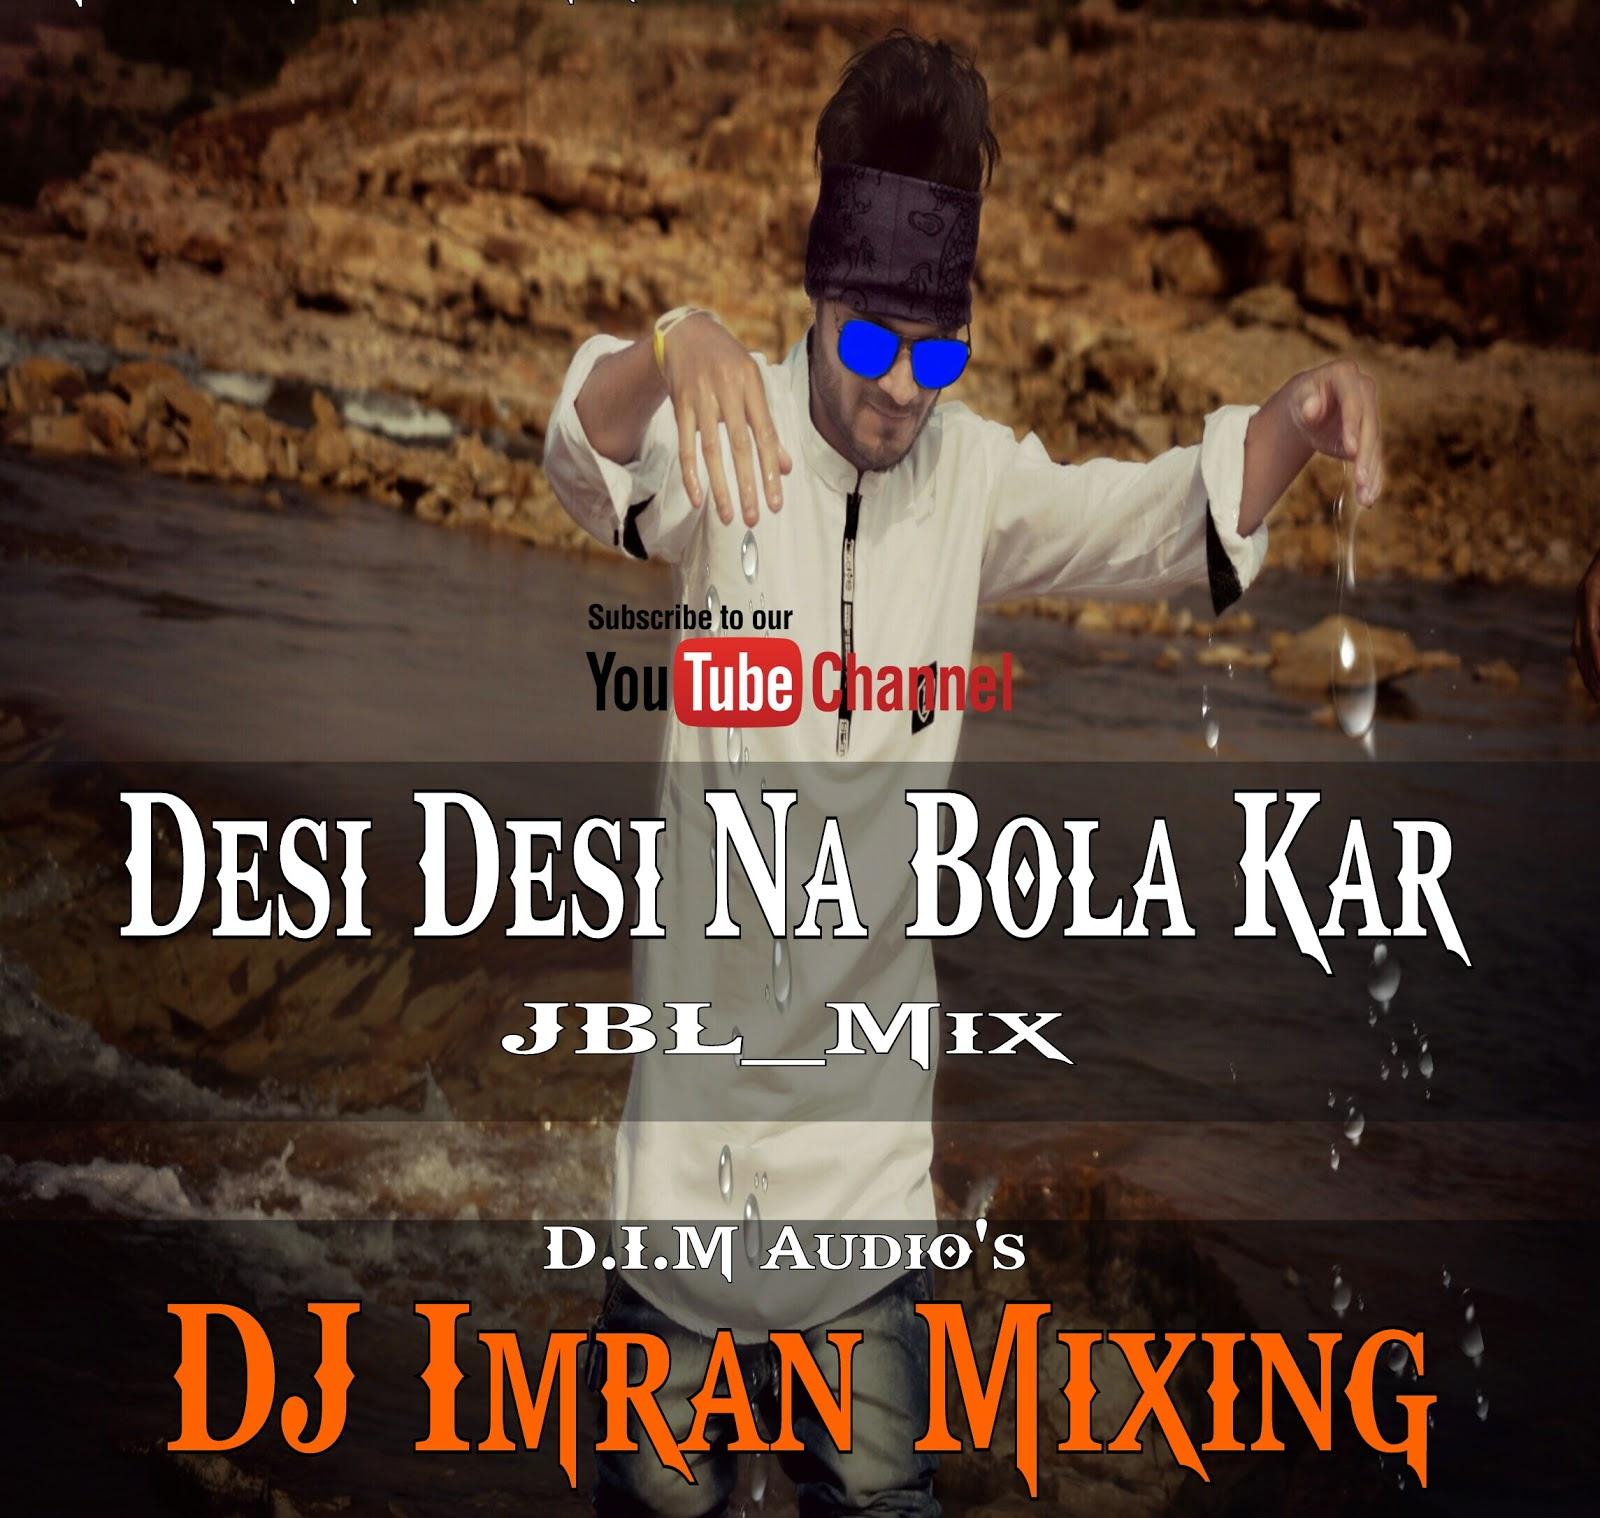 Imran Khan Song I Am Rider Mp3 Download: DJ Imran Mixing_D.I.M Audio Sagar M.P.: Download:-DESI